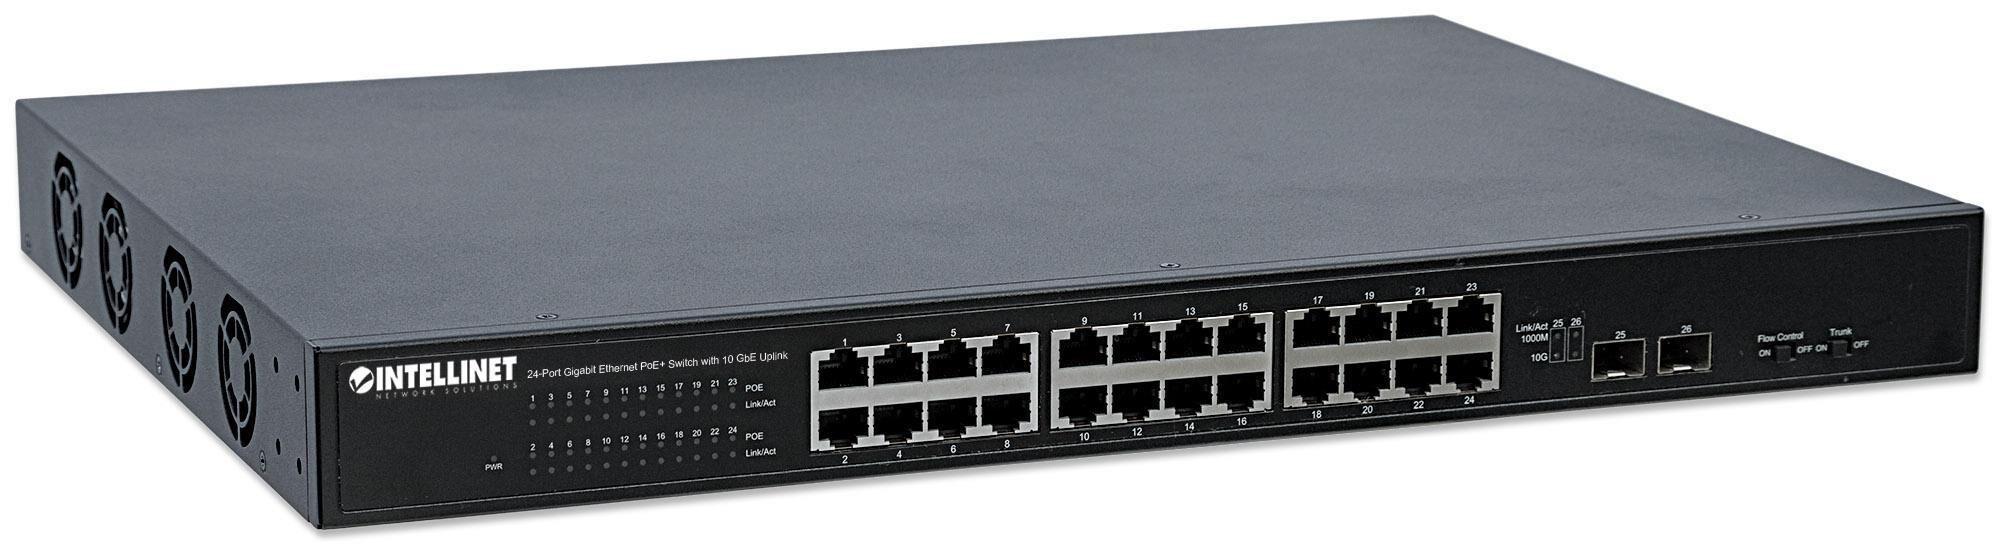 intellinet switch gigabit ethernet 24 porte poe+ con 2 porte sfp+ 10gbe